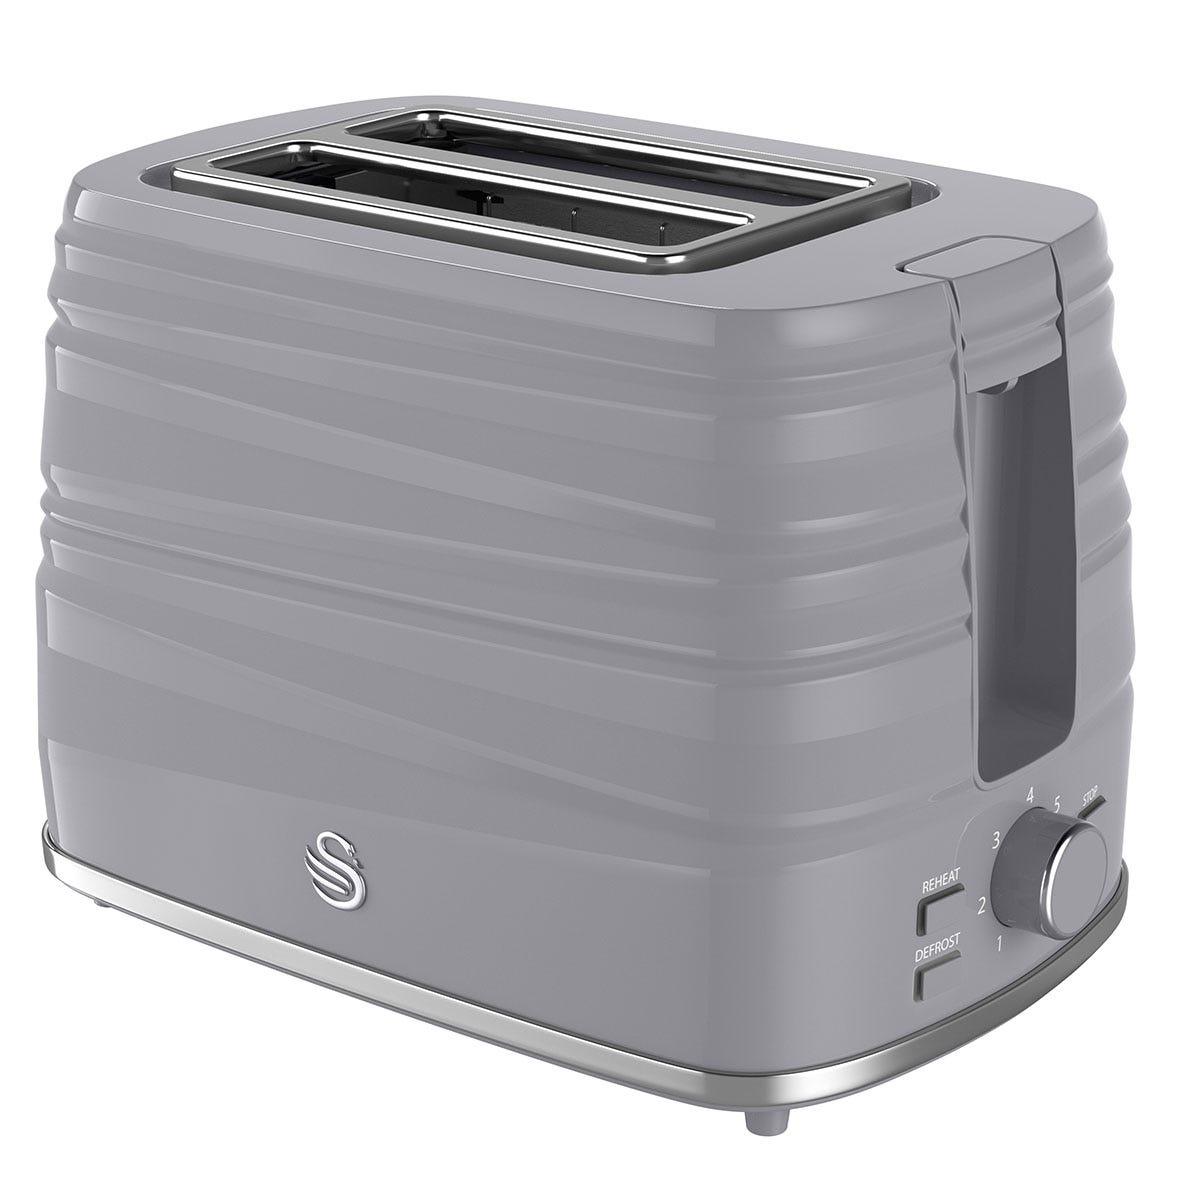 Swan ST31050GRN 2-Slice Toaster - Grey